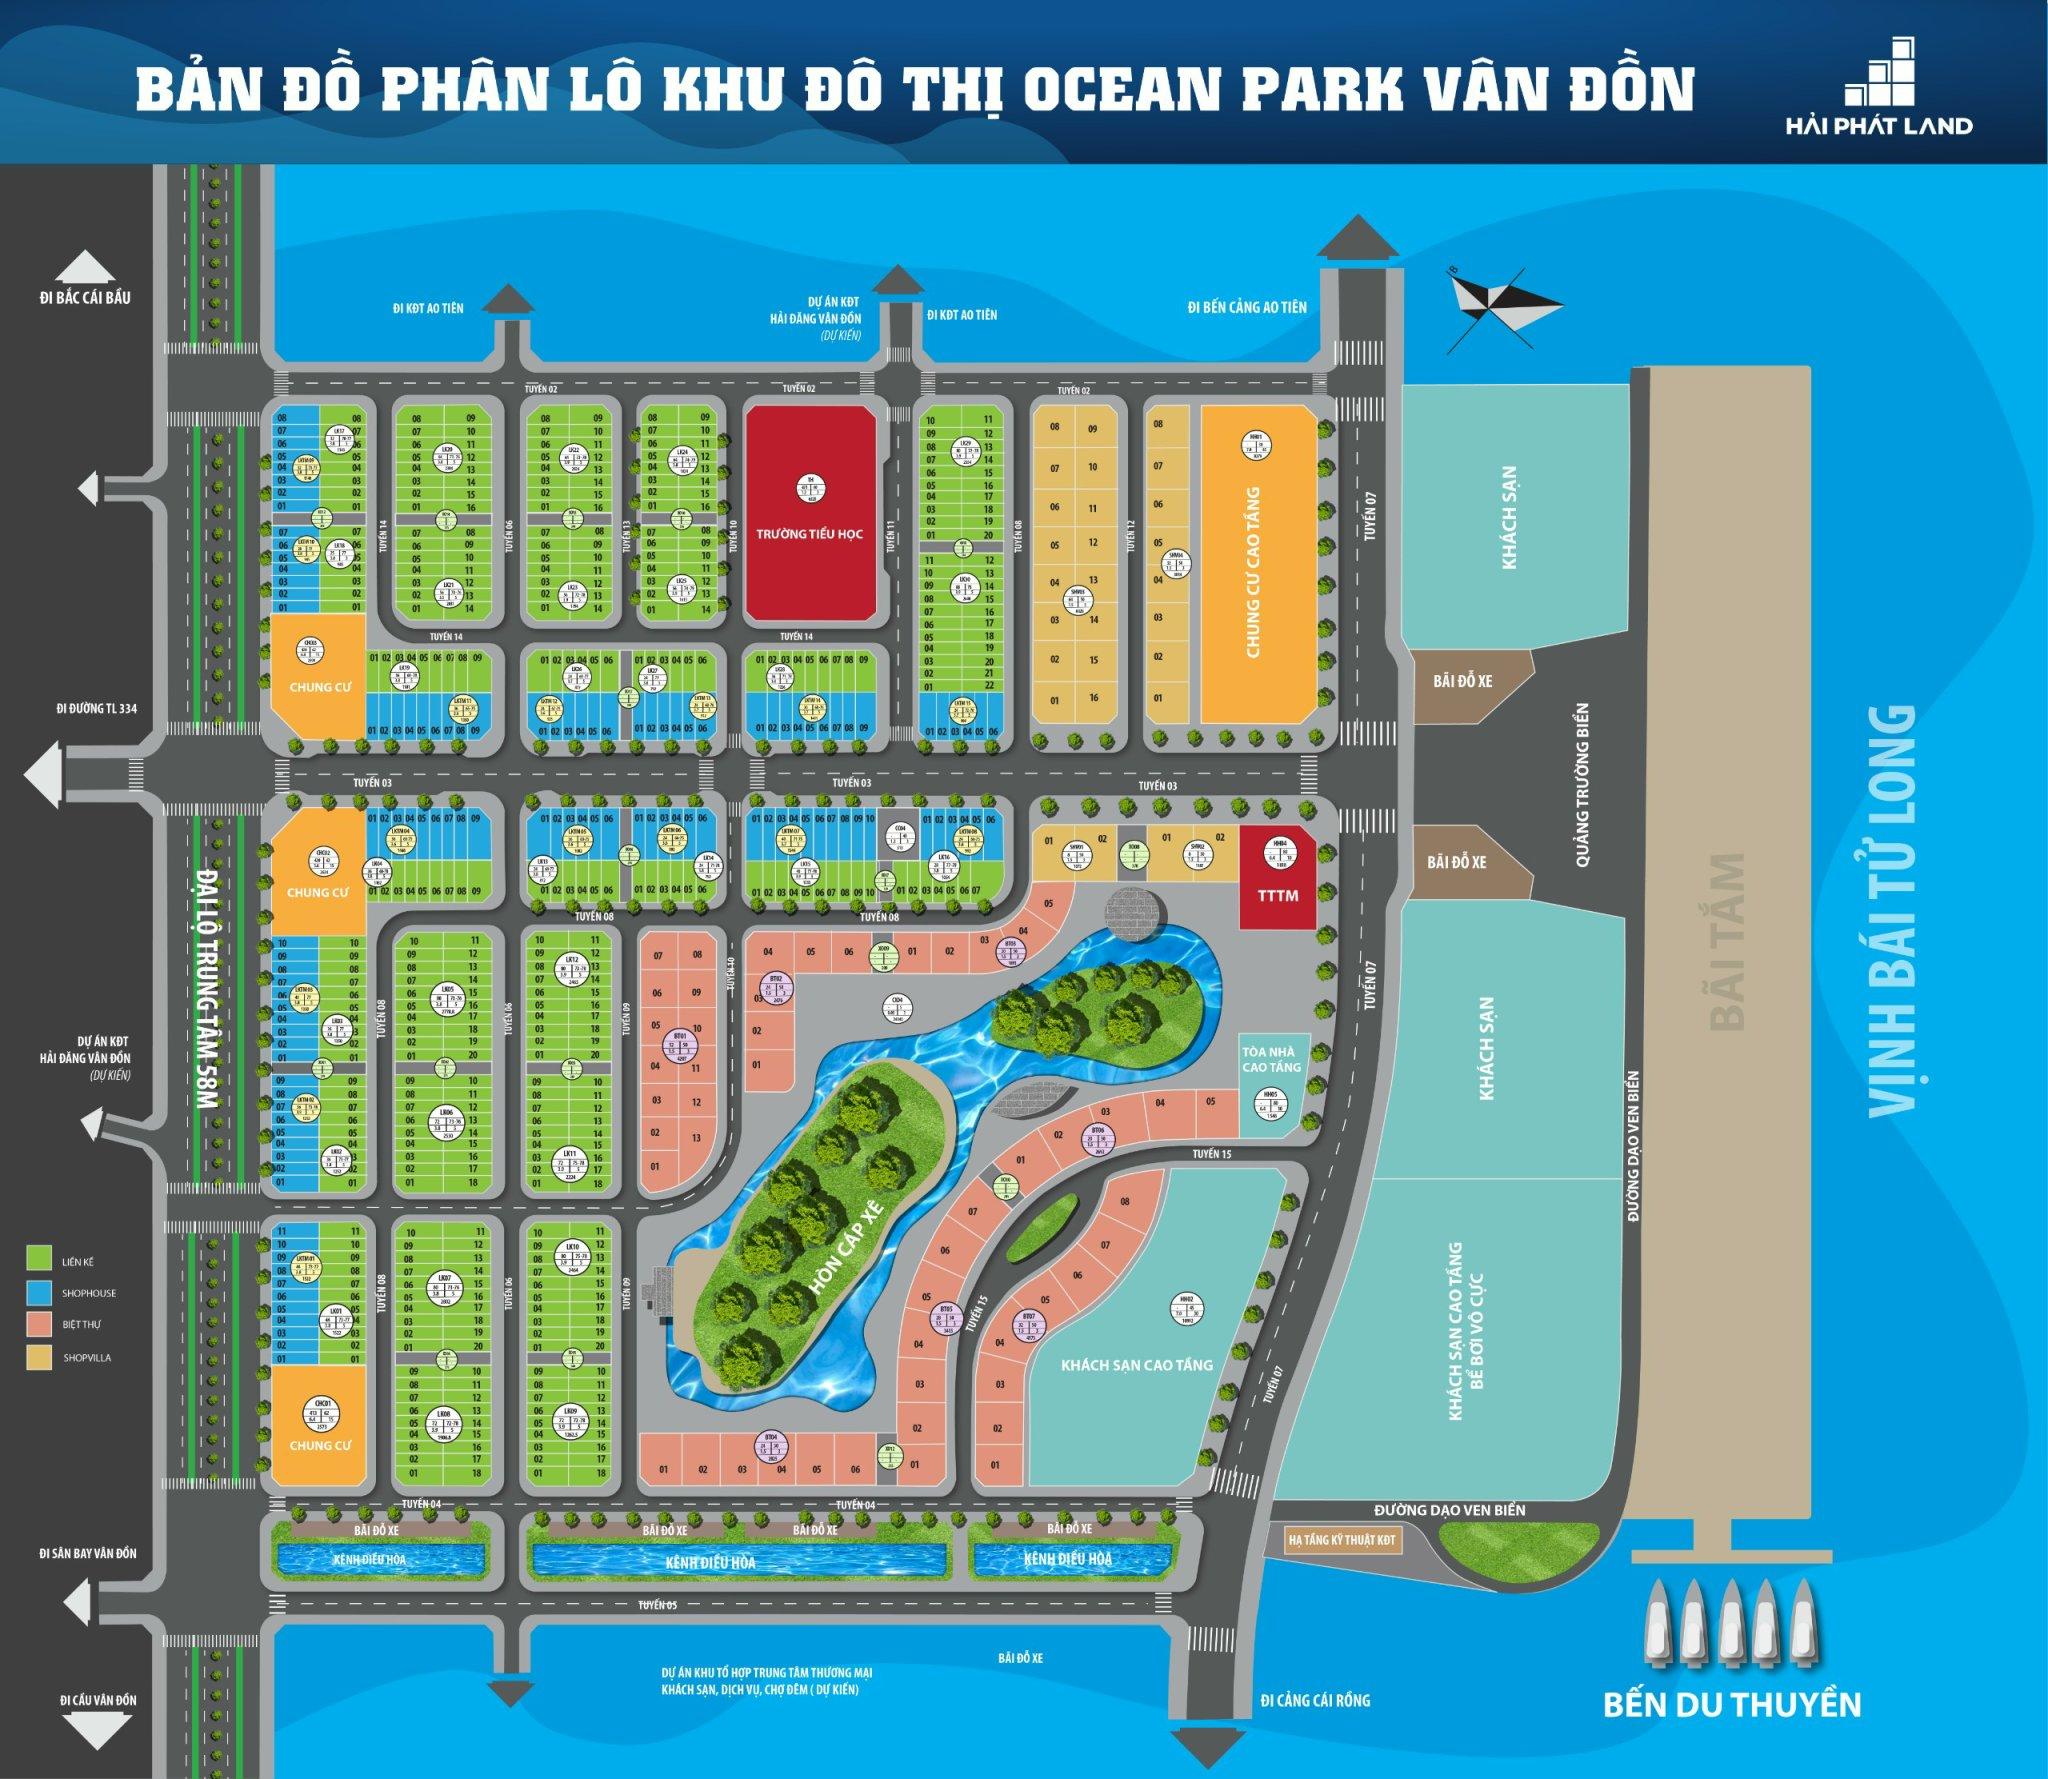 mặt bằng dự án ocean park vân đồn